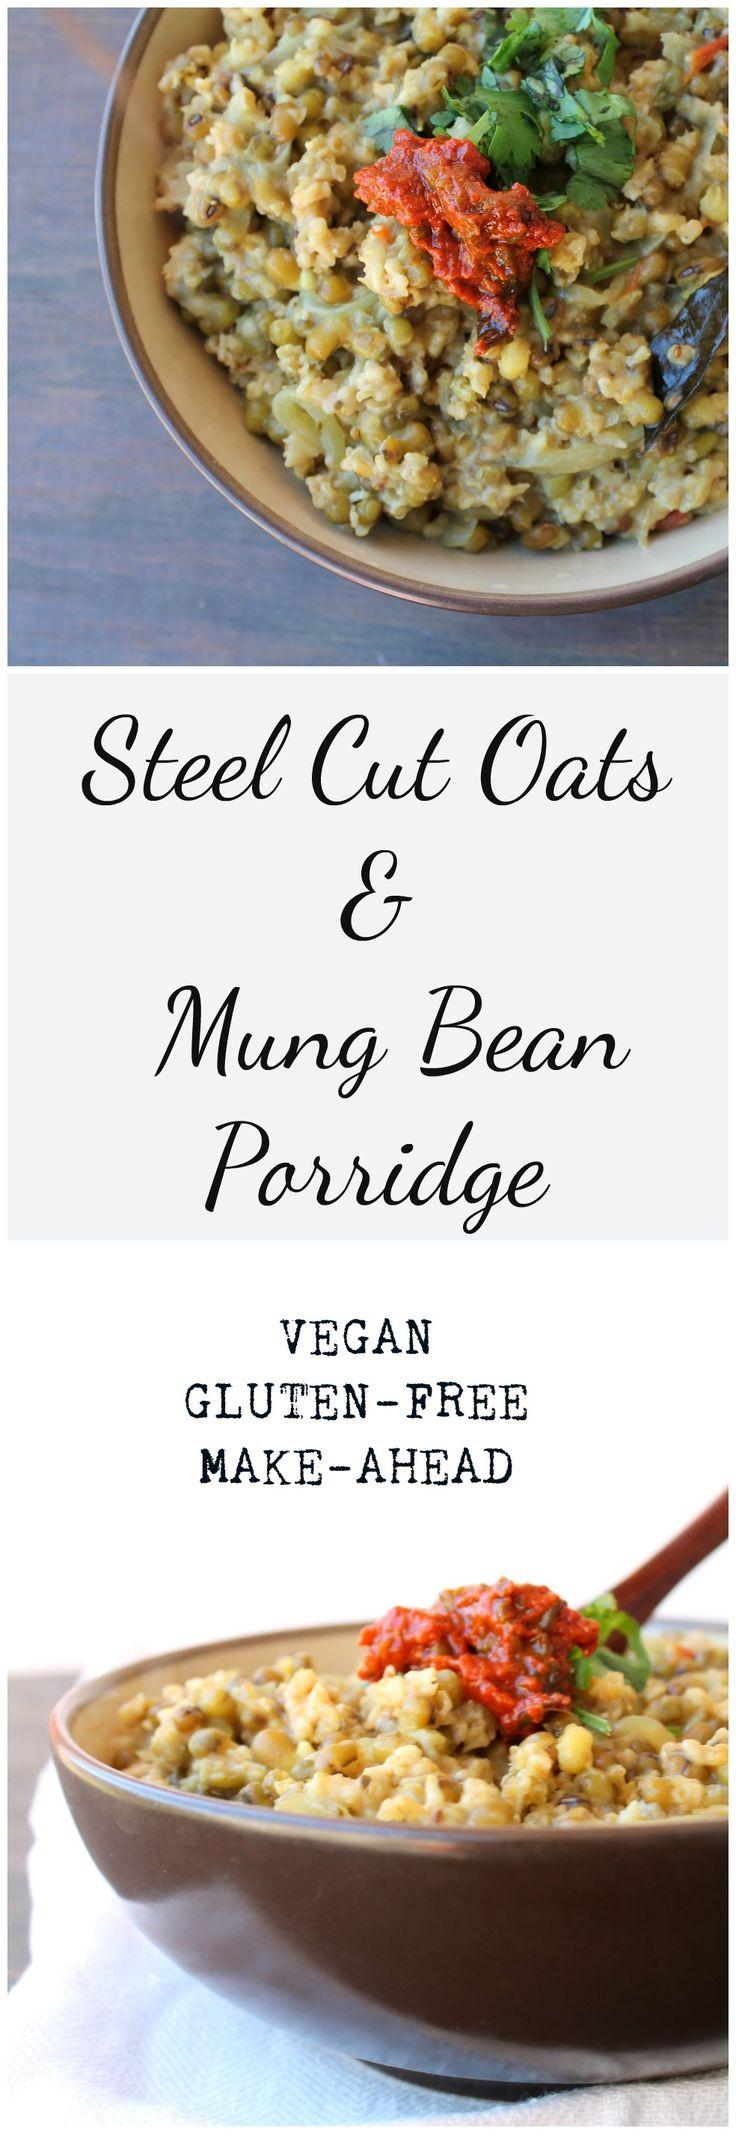 Steel Cut Oats & Mung Bean Porridge - Food, Pleasure, and Health